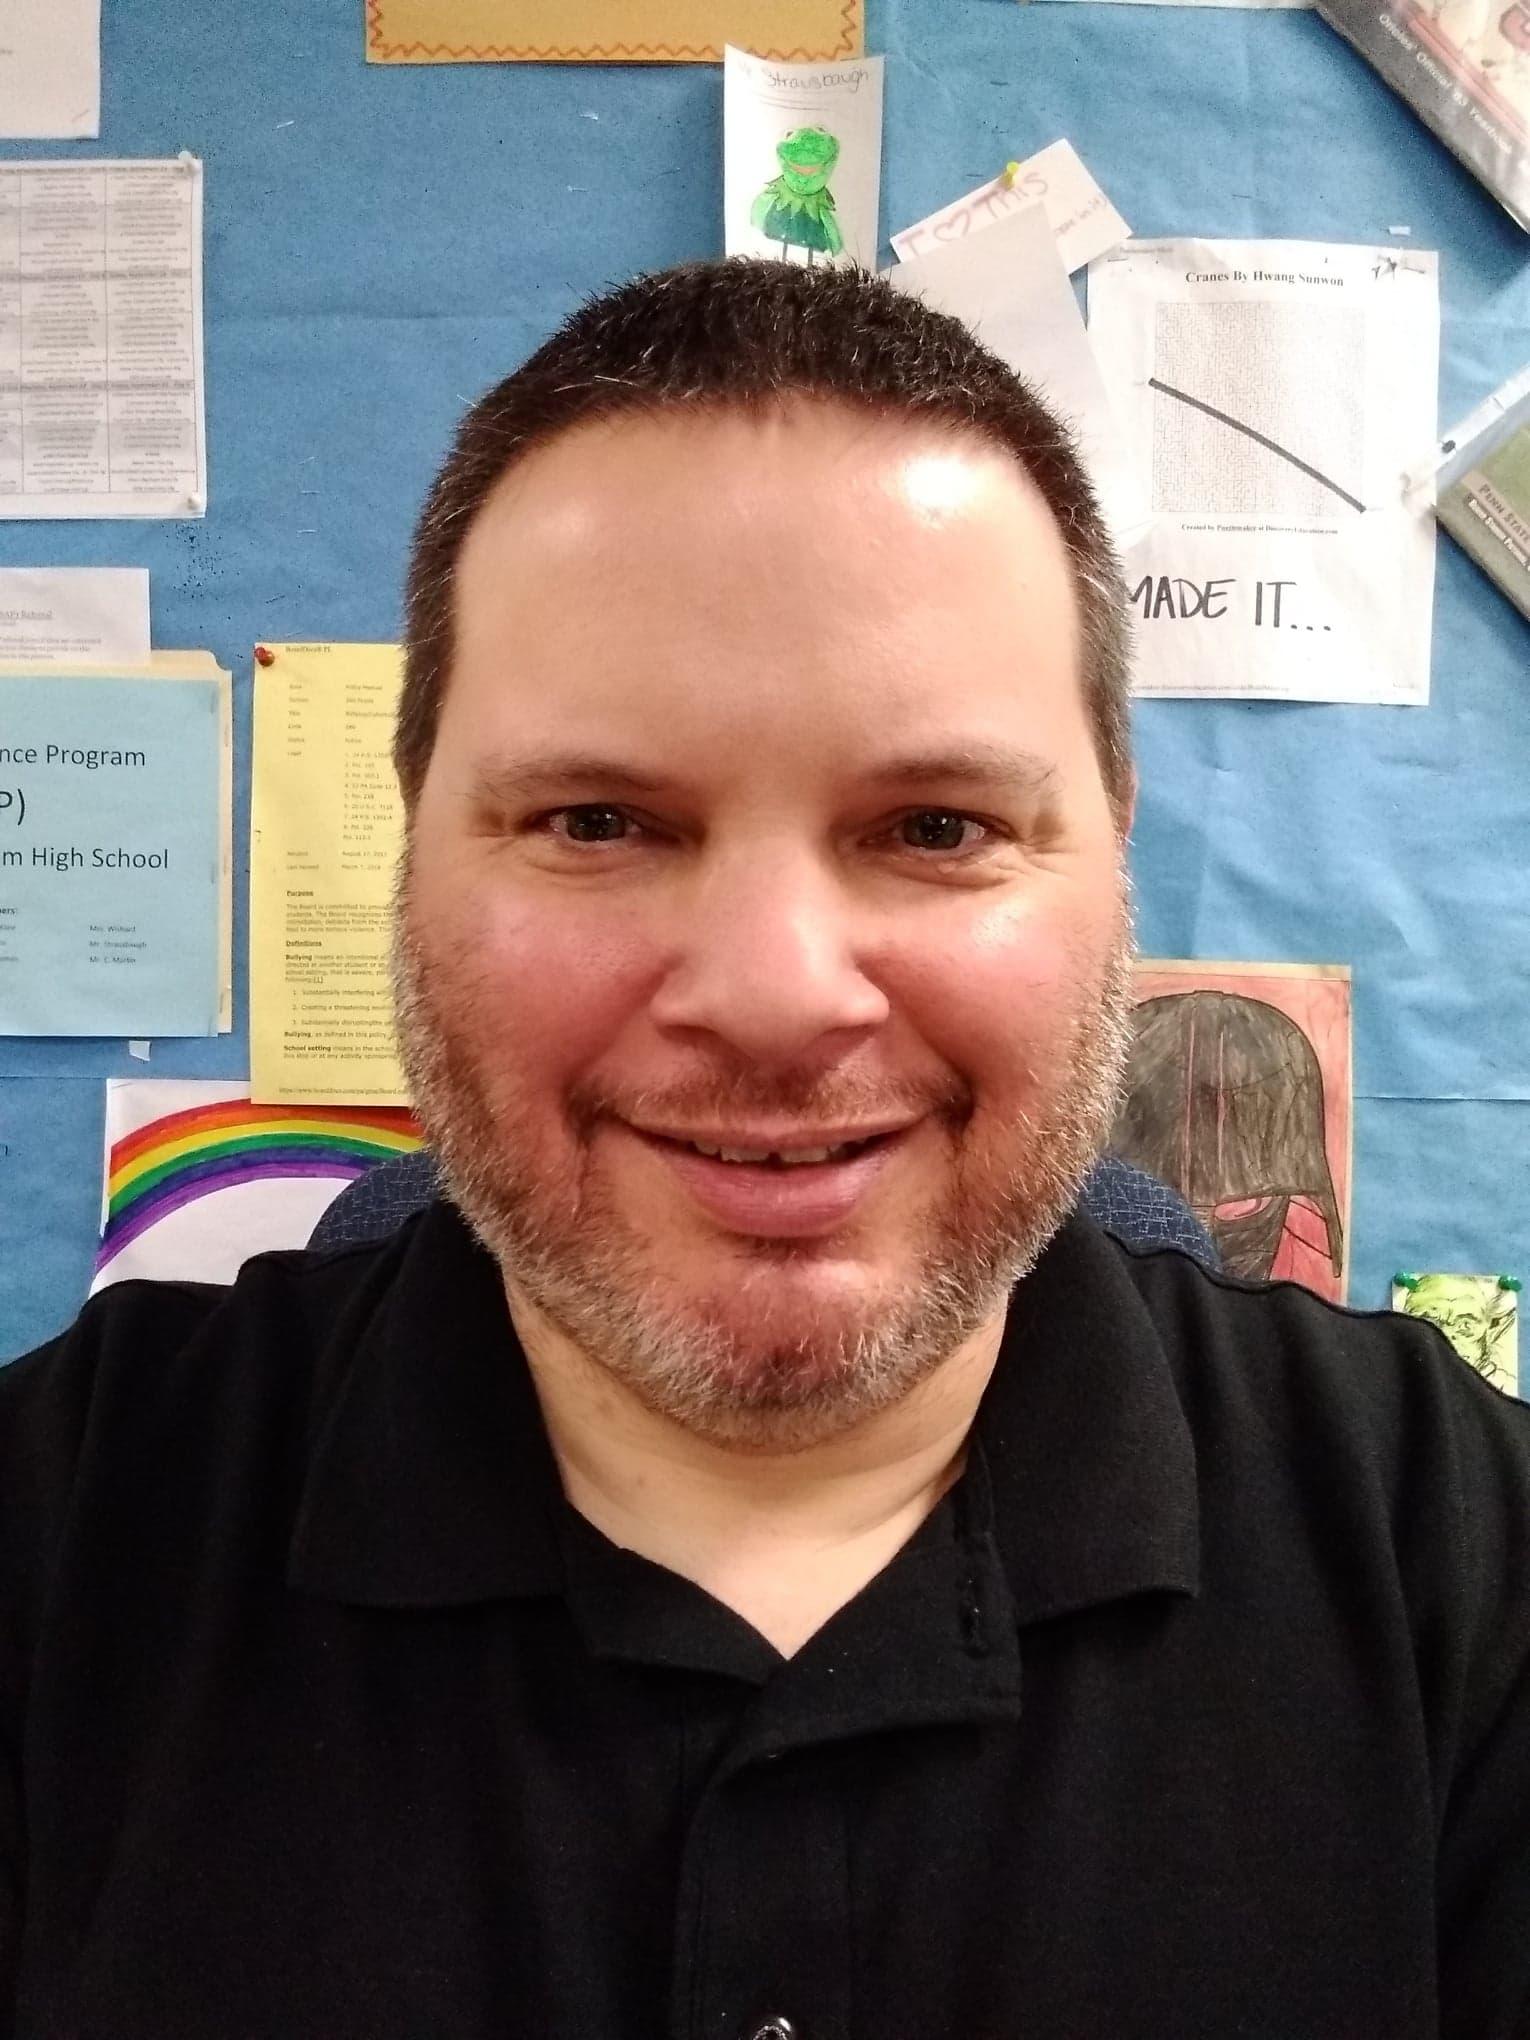 Dave Strausbaugh